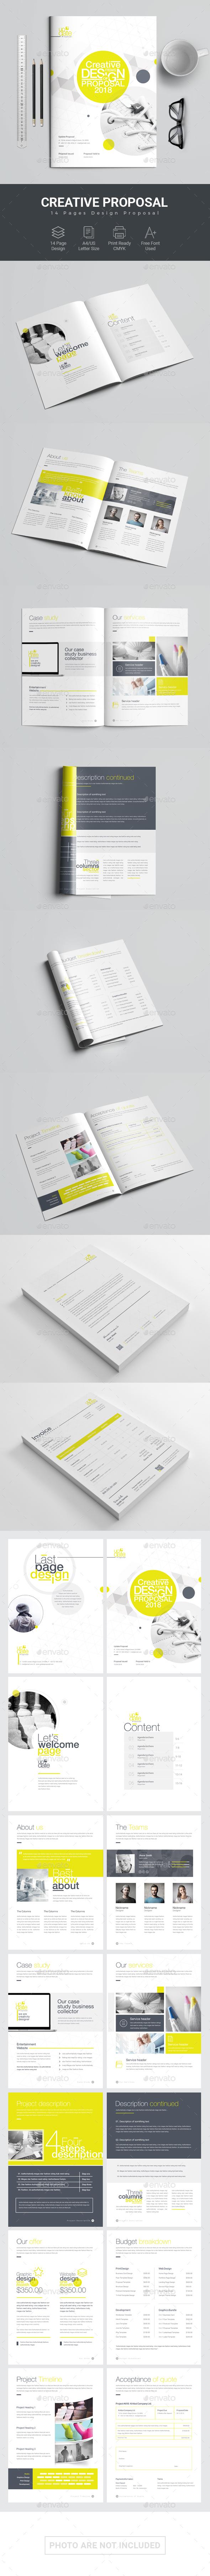 GraphicRiver Proposal 20657455